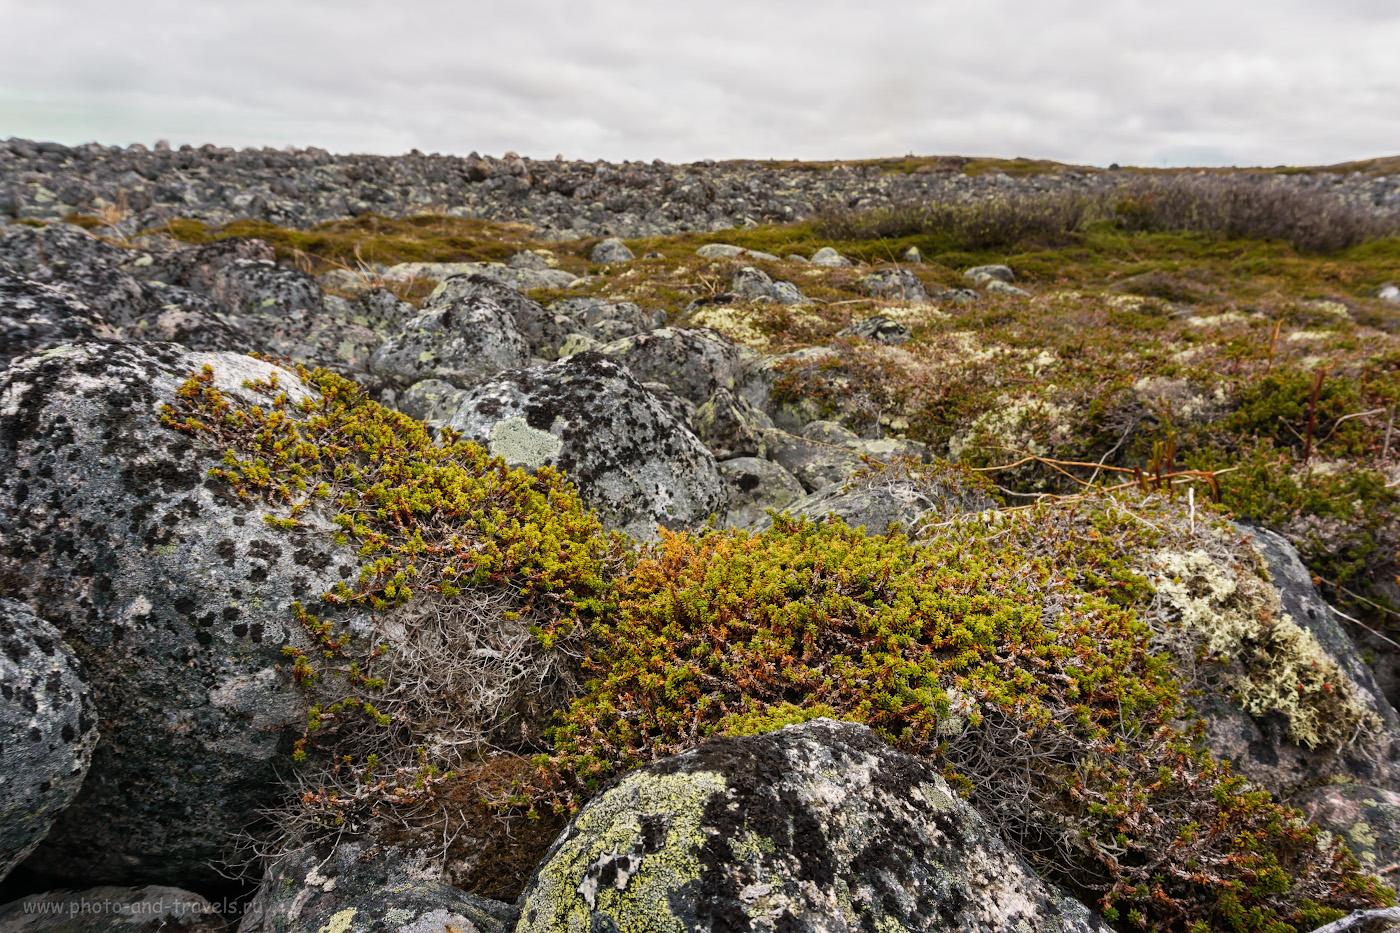 Фотография 20. Каменистая тундра на берегу Северного Ледовитого океана.